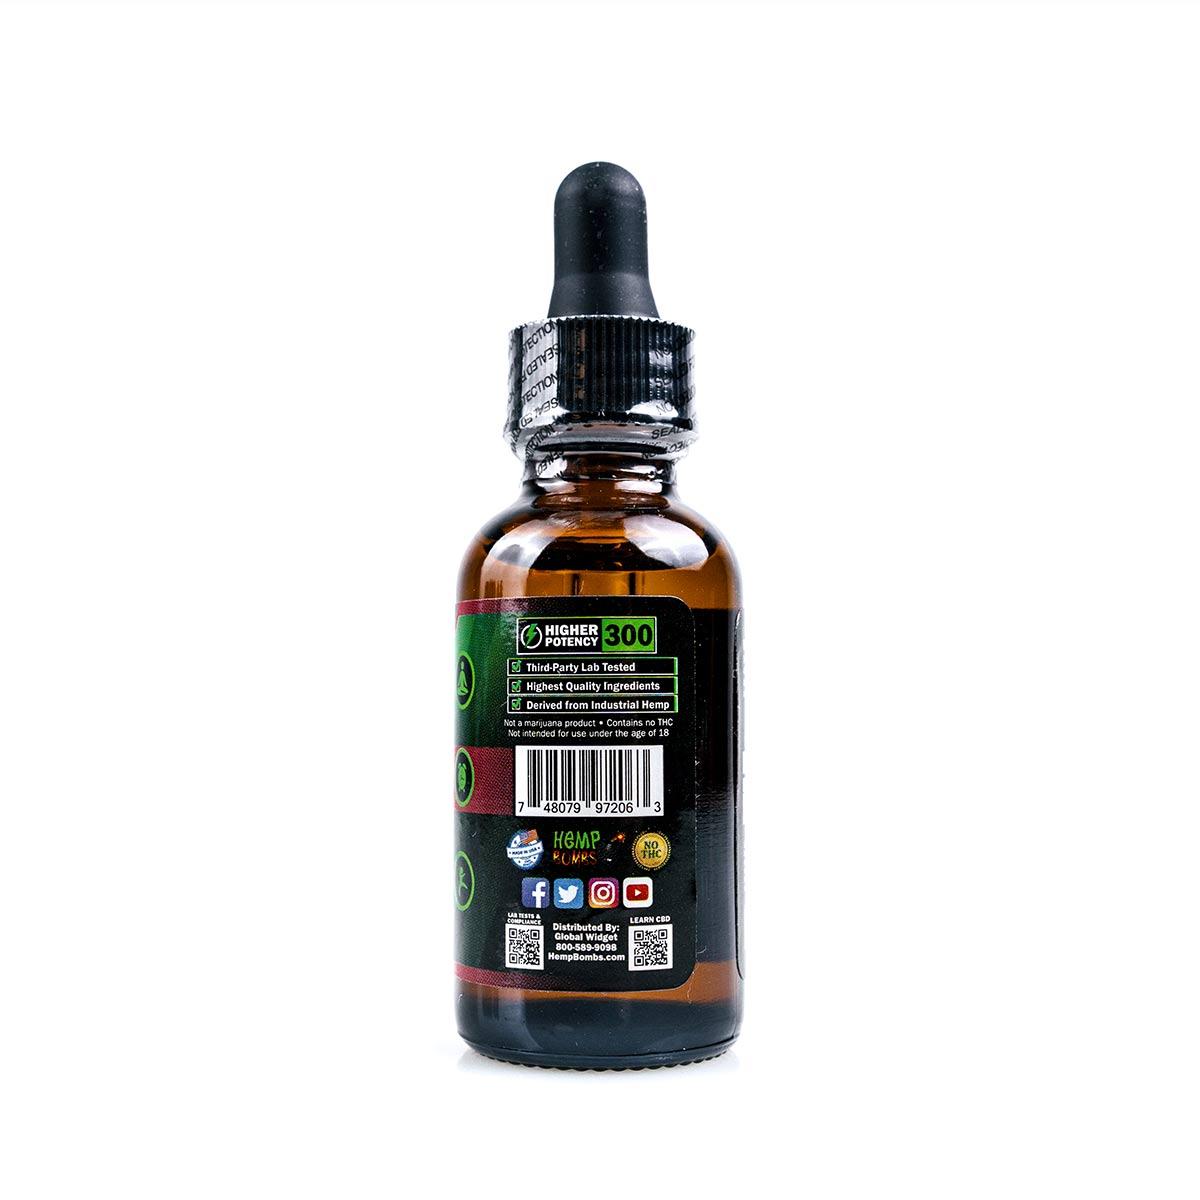 Hemp-Bombs,-CBD-Oil,-Broad-Spectrum-THC-free,-Watermelon,-1oz,-300mg-of-CBD-back